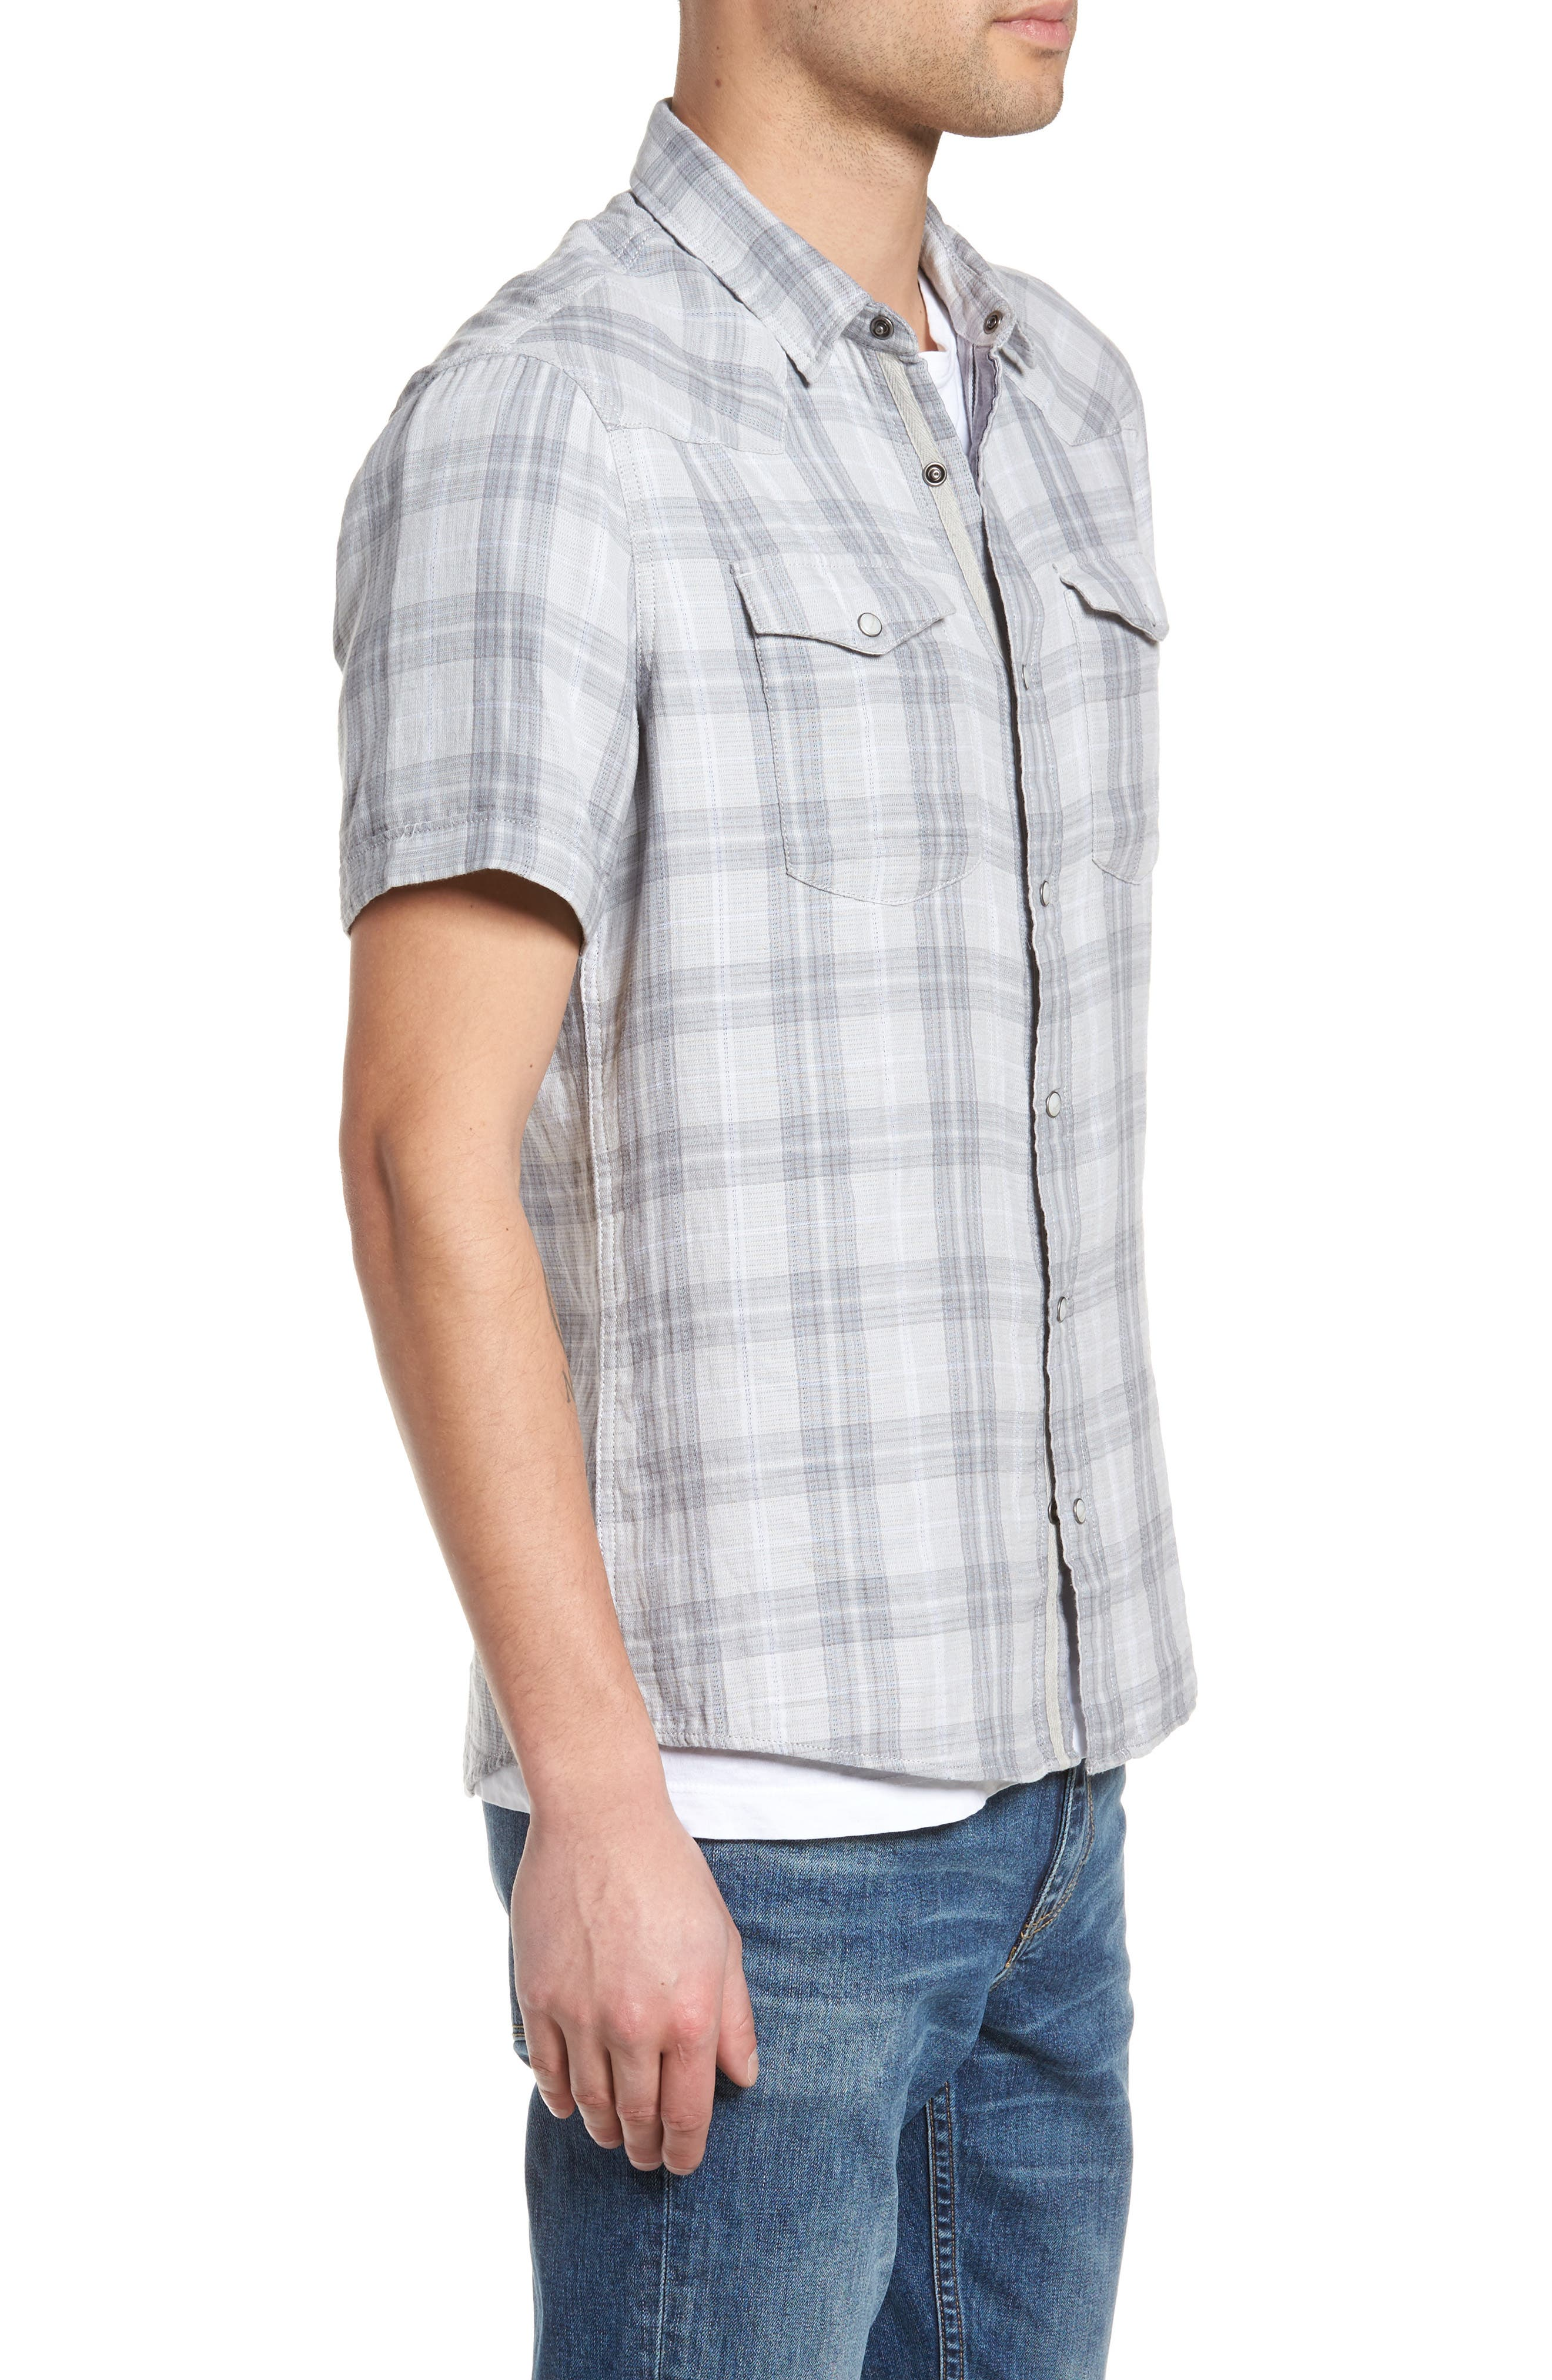 Plaid Short Sleeve Sport Shirt,                             Alternate thumbnail 3, color,                             Grey Sleet Plaid Duofold